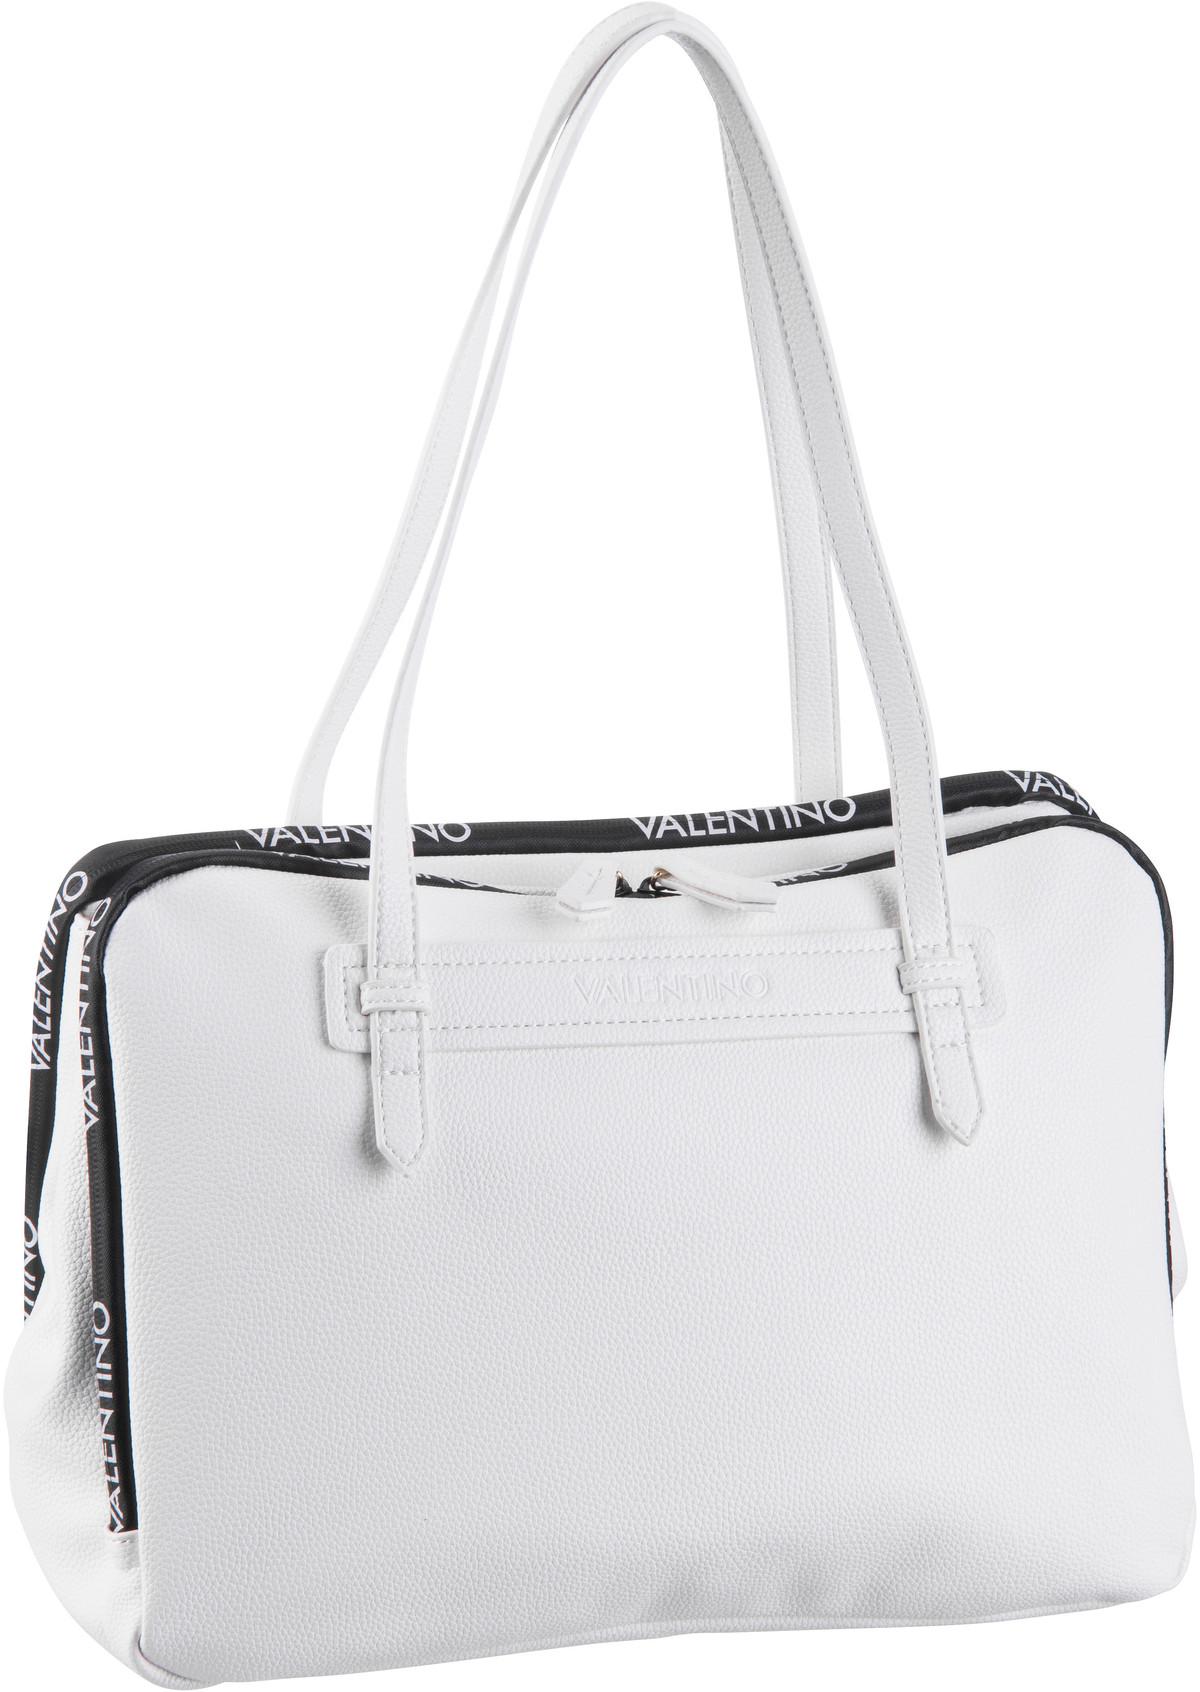 valentino bags -  Handtasche Doxy Porta PC V02 Bianco